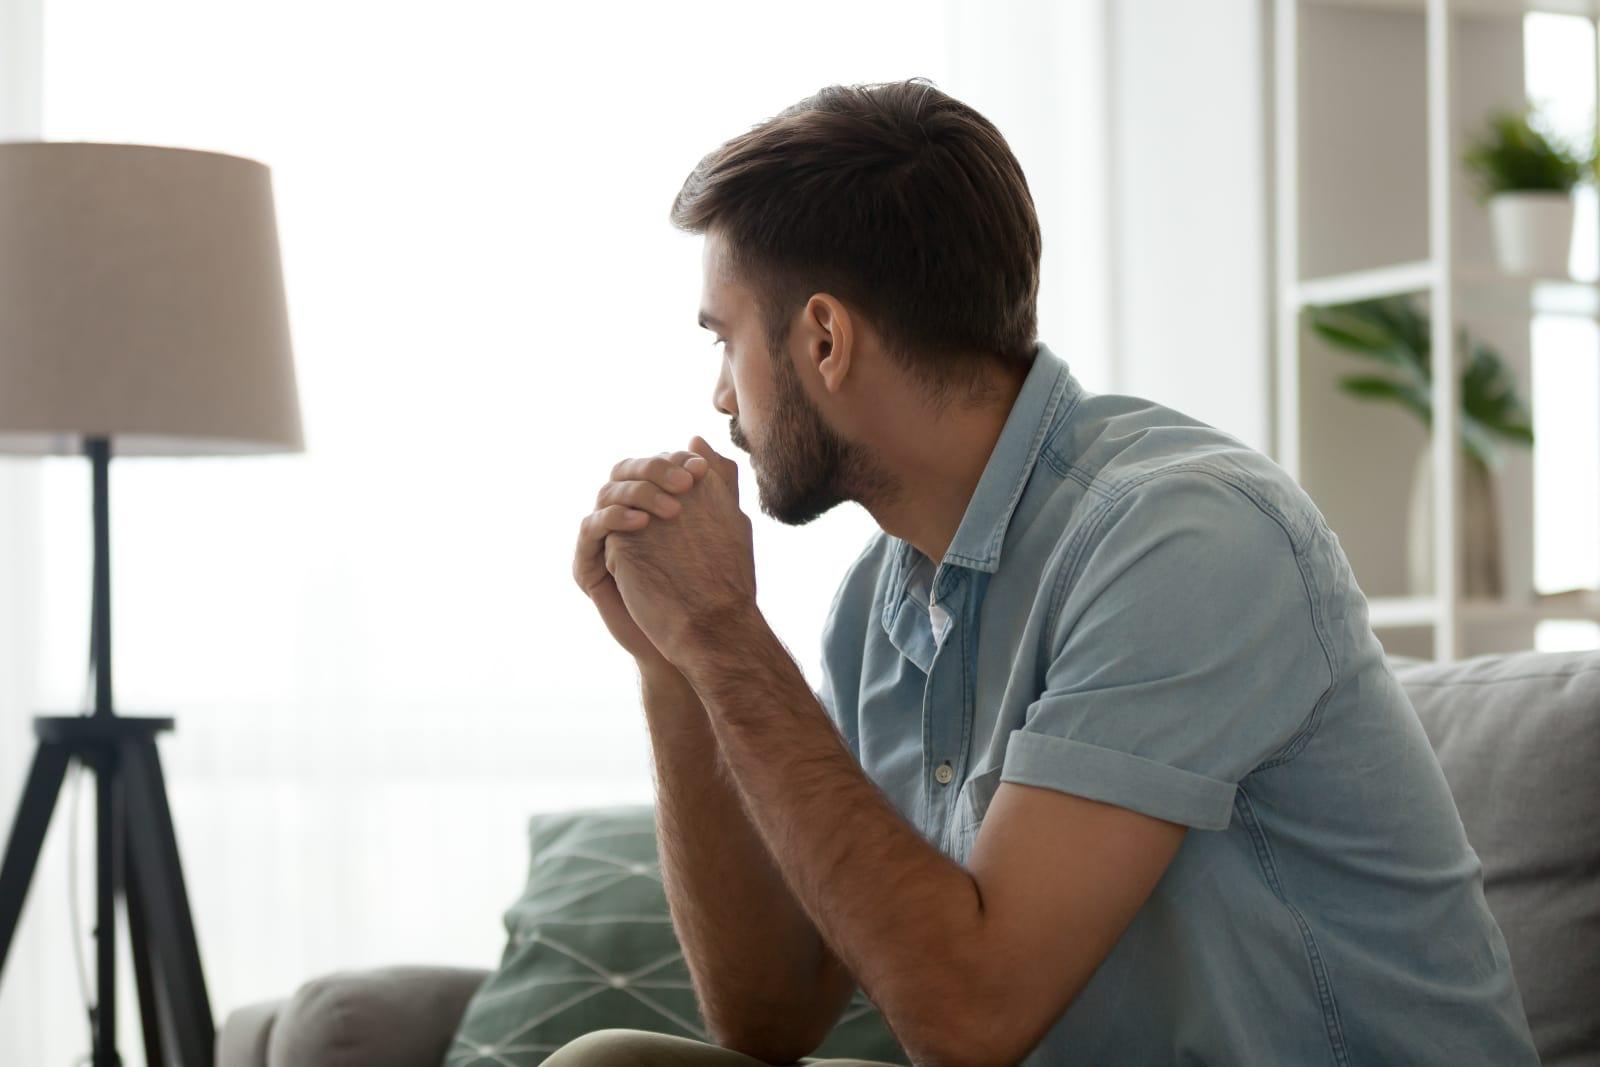 a worried man sits alone